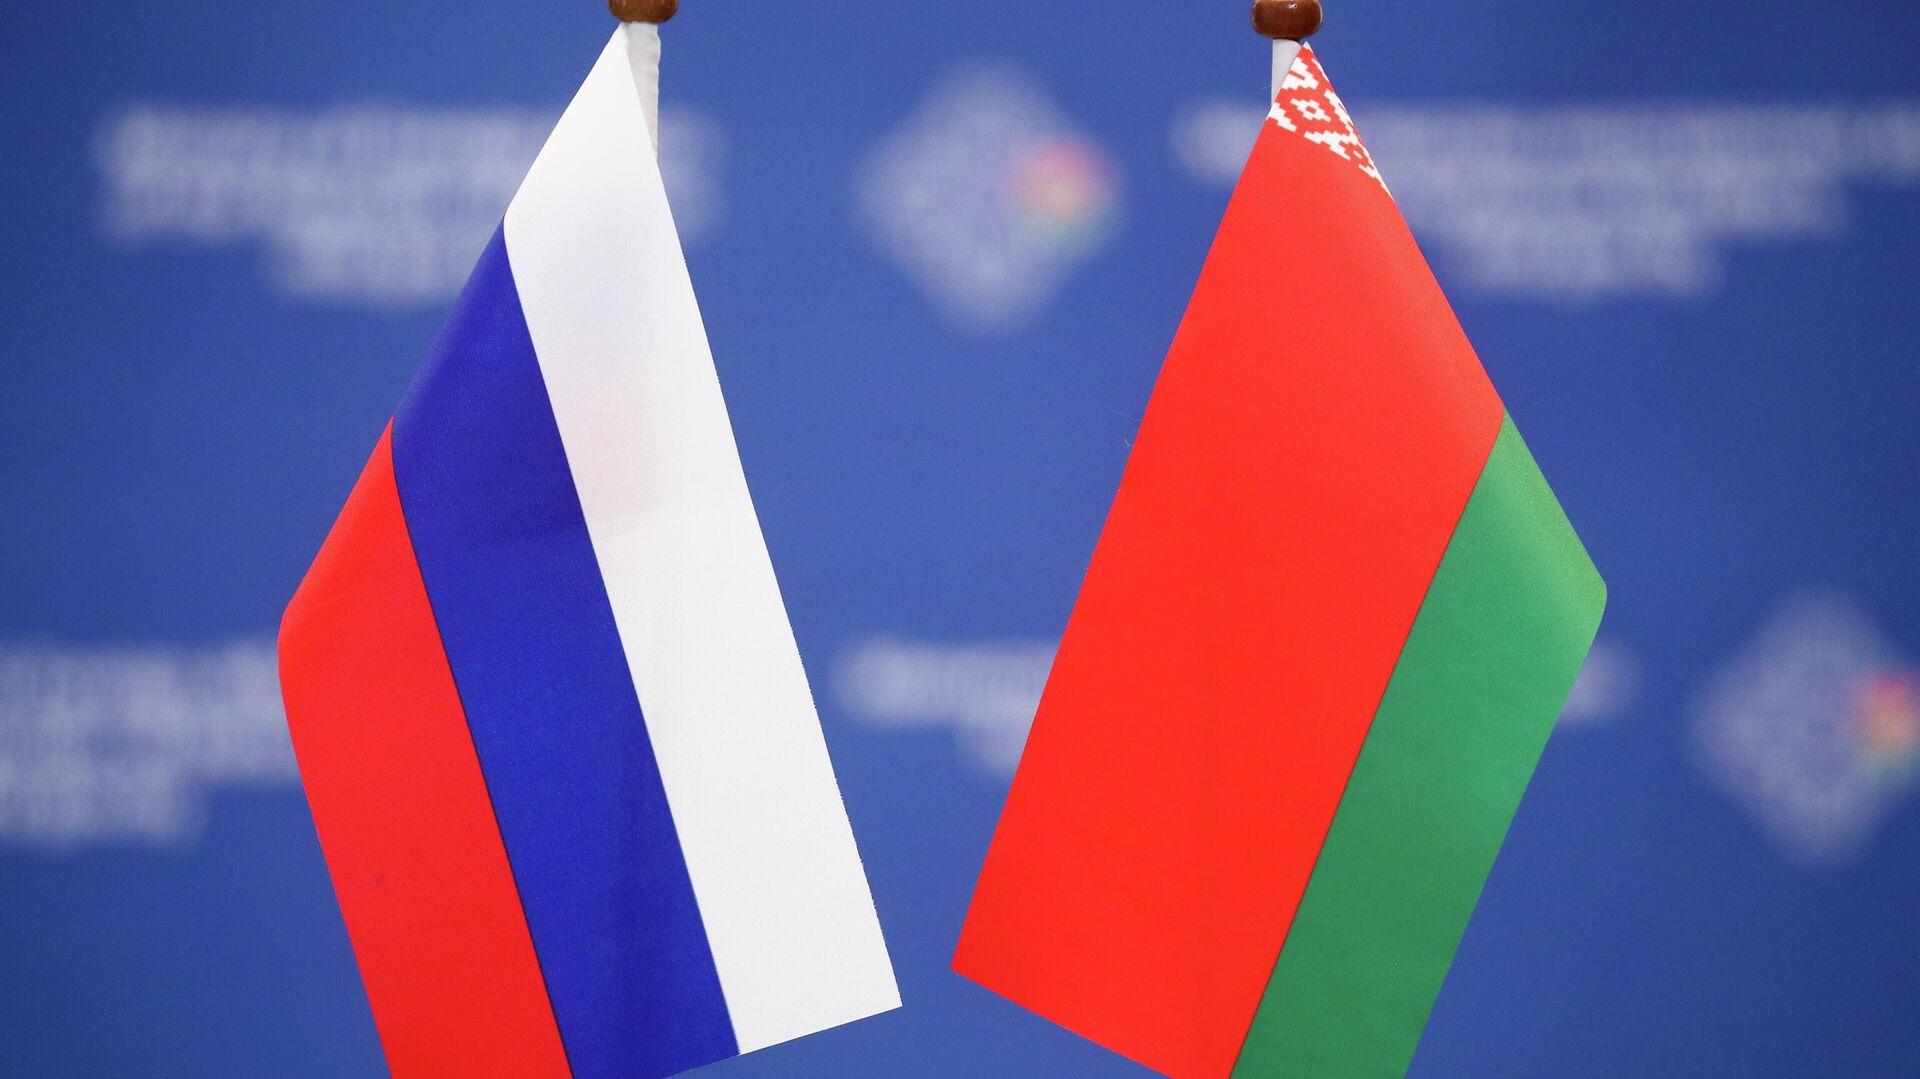 Флаги России и Белоруссии - РИА Новости, 1920, 30.12.2020